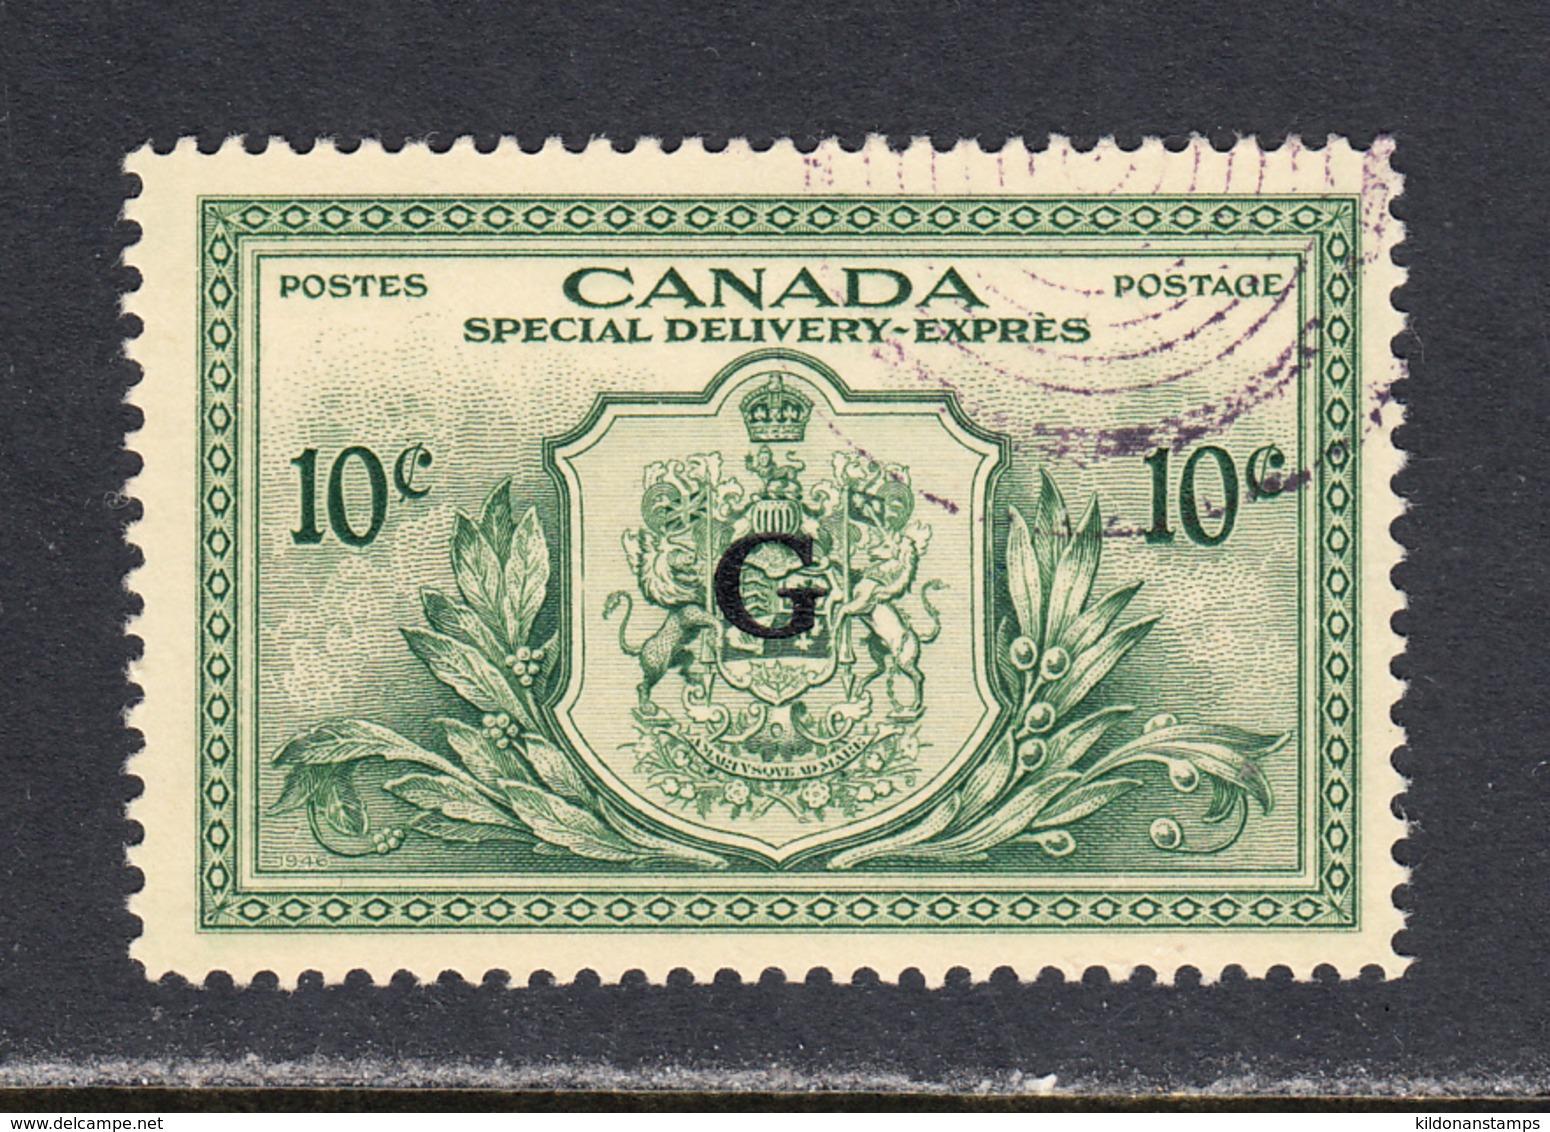 Canada 1950 Official, Special Delivery, Cancelled, Sc# E02, SG OS21 - Officials